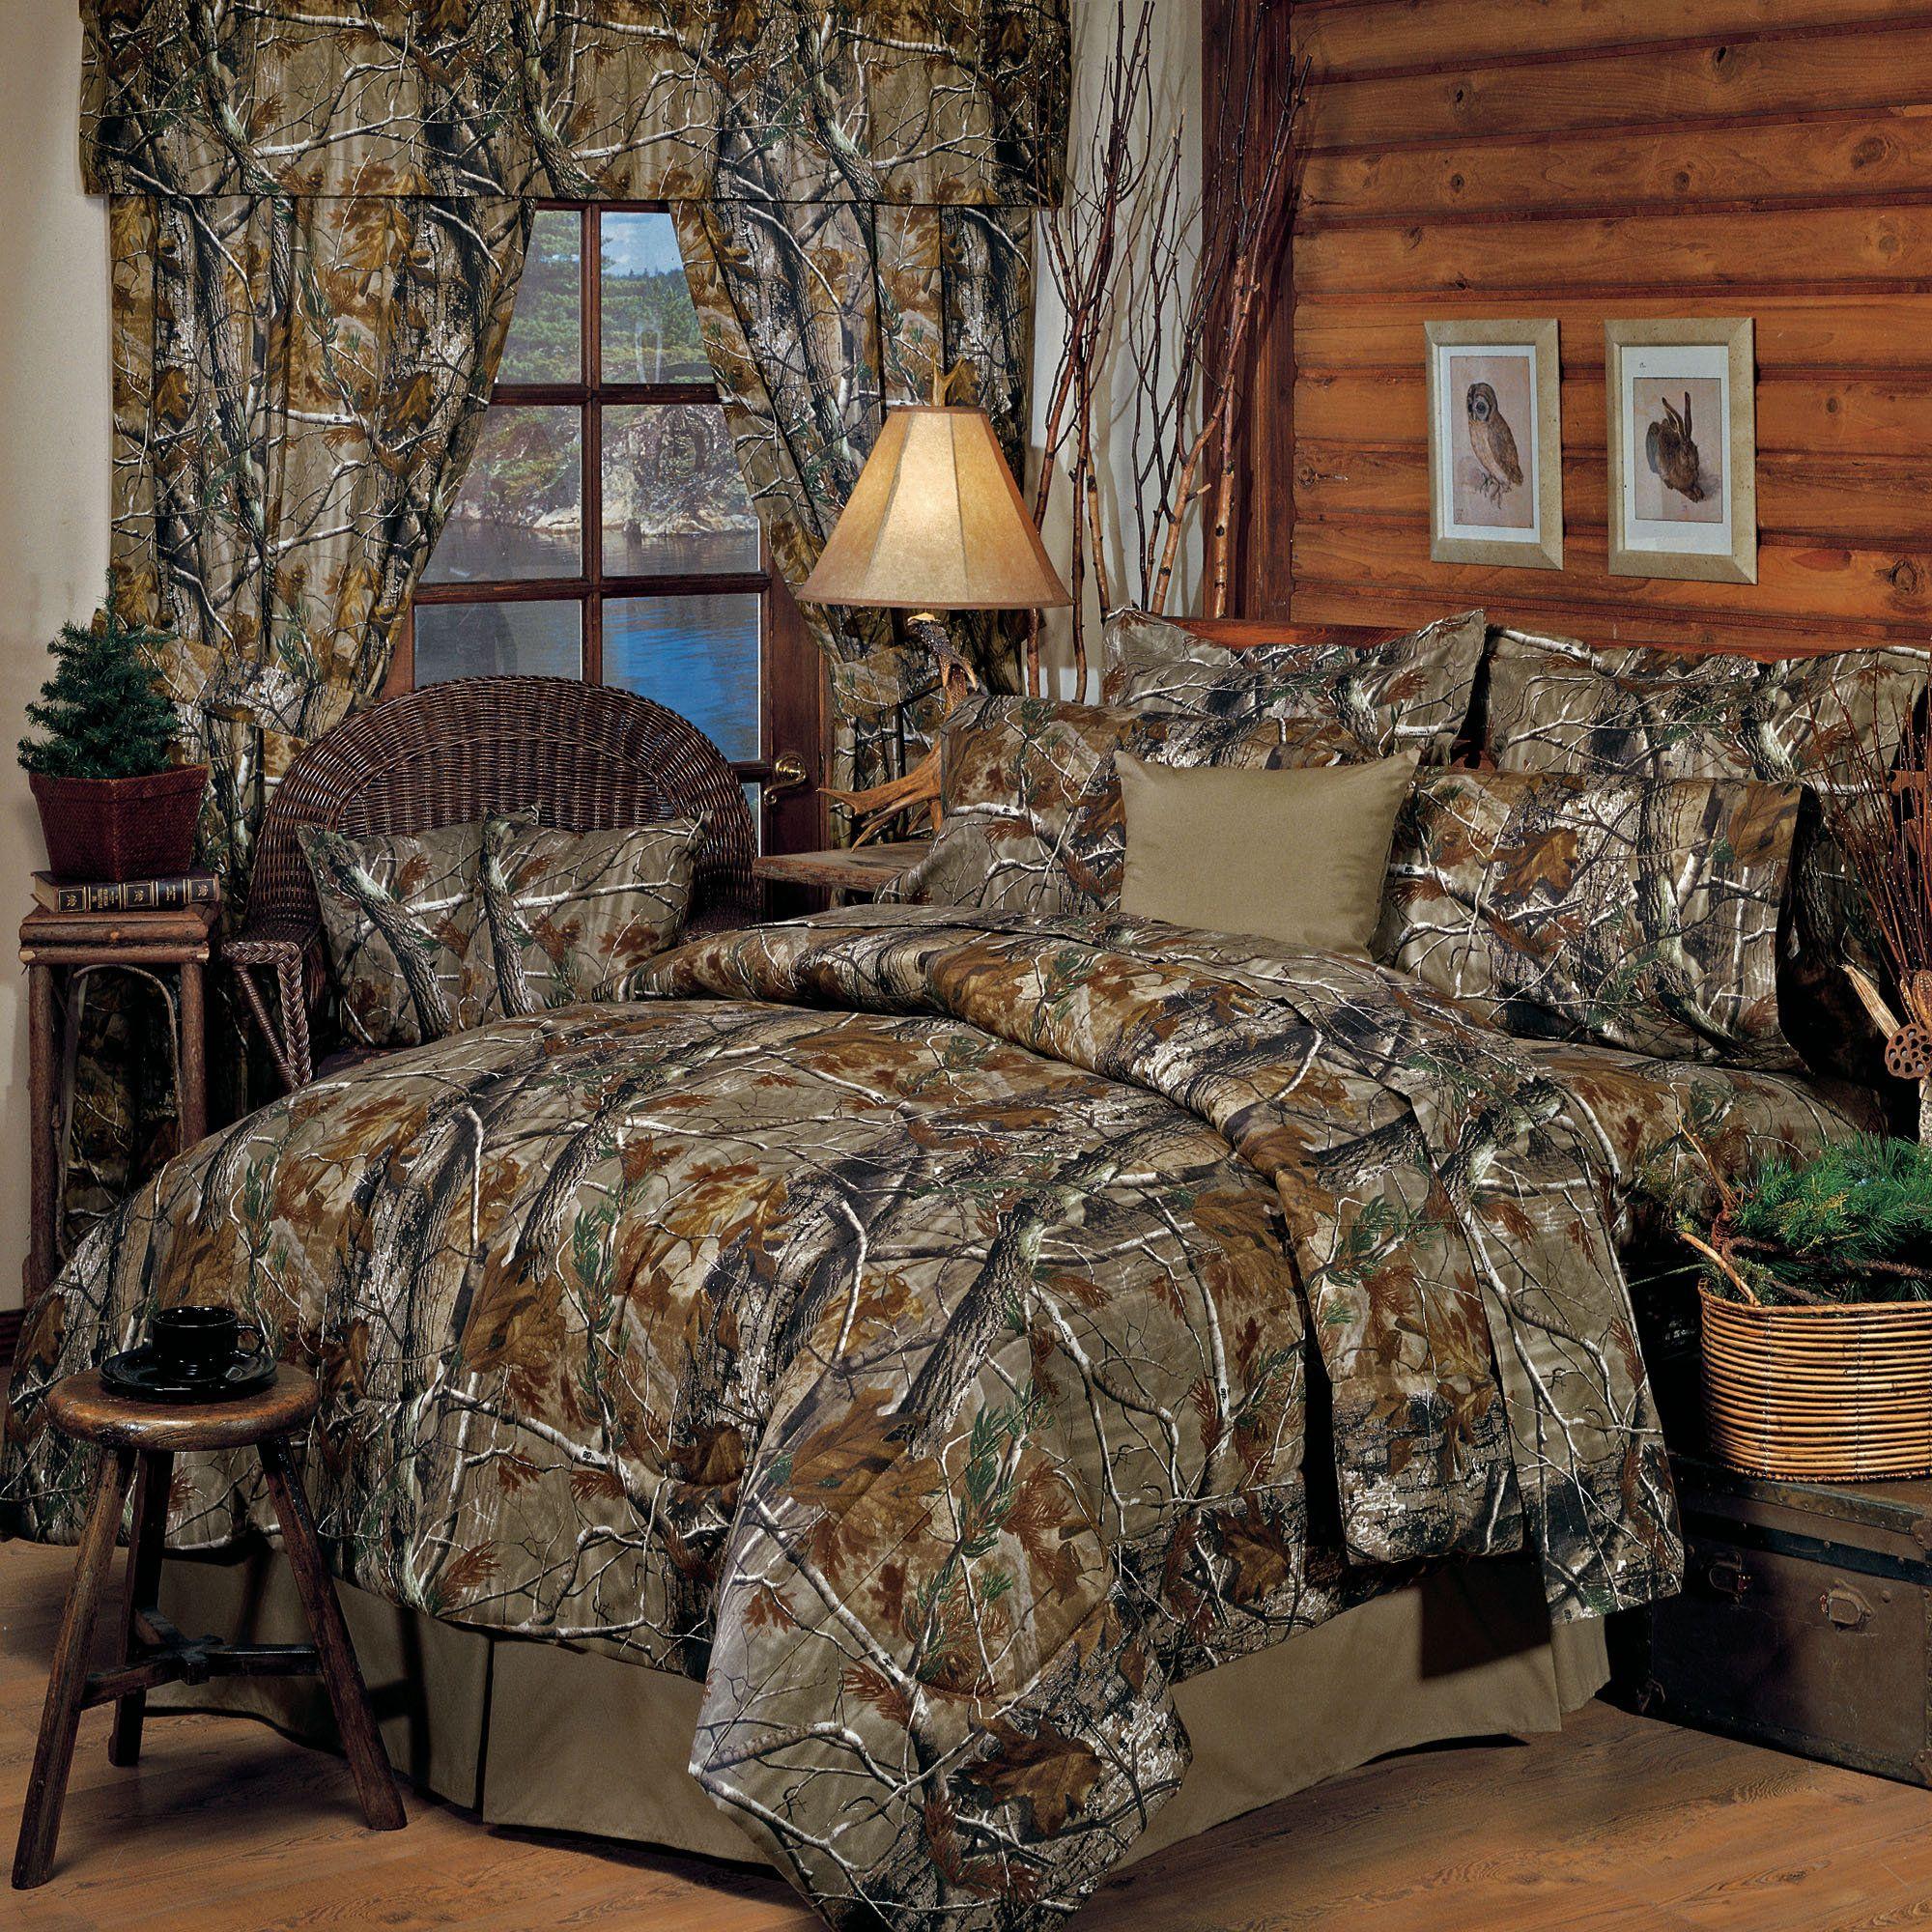 RealtreeR Rustic Camo Comforter Bedding